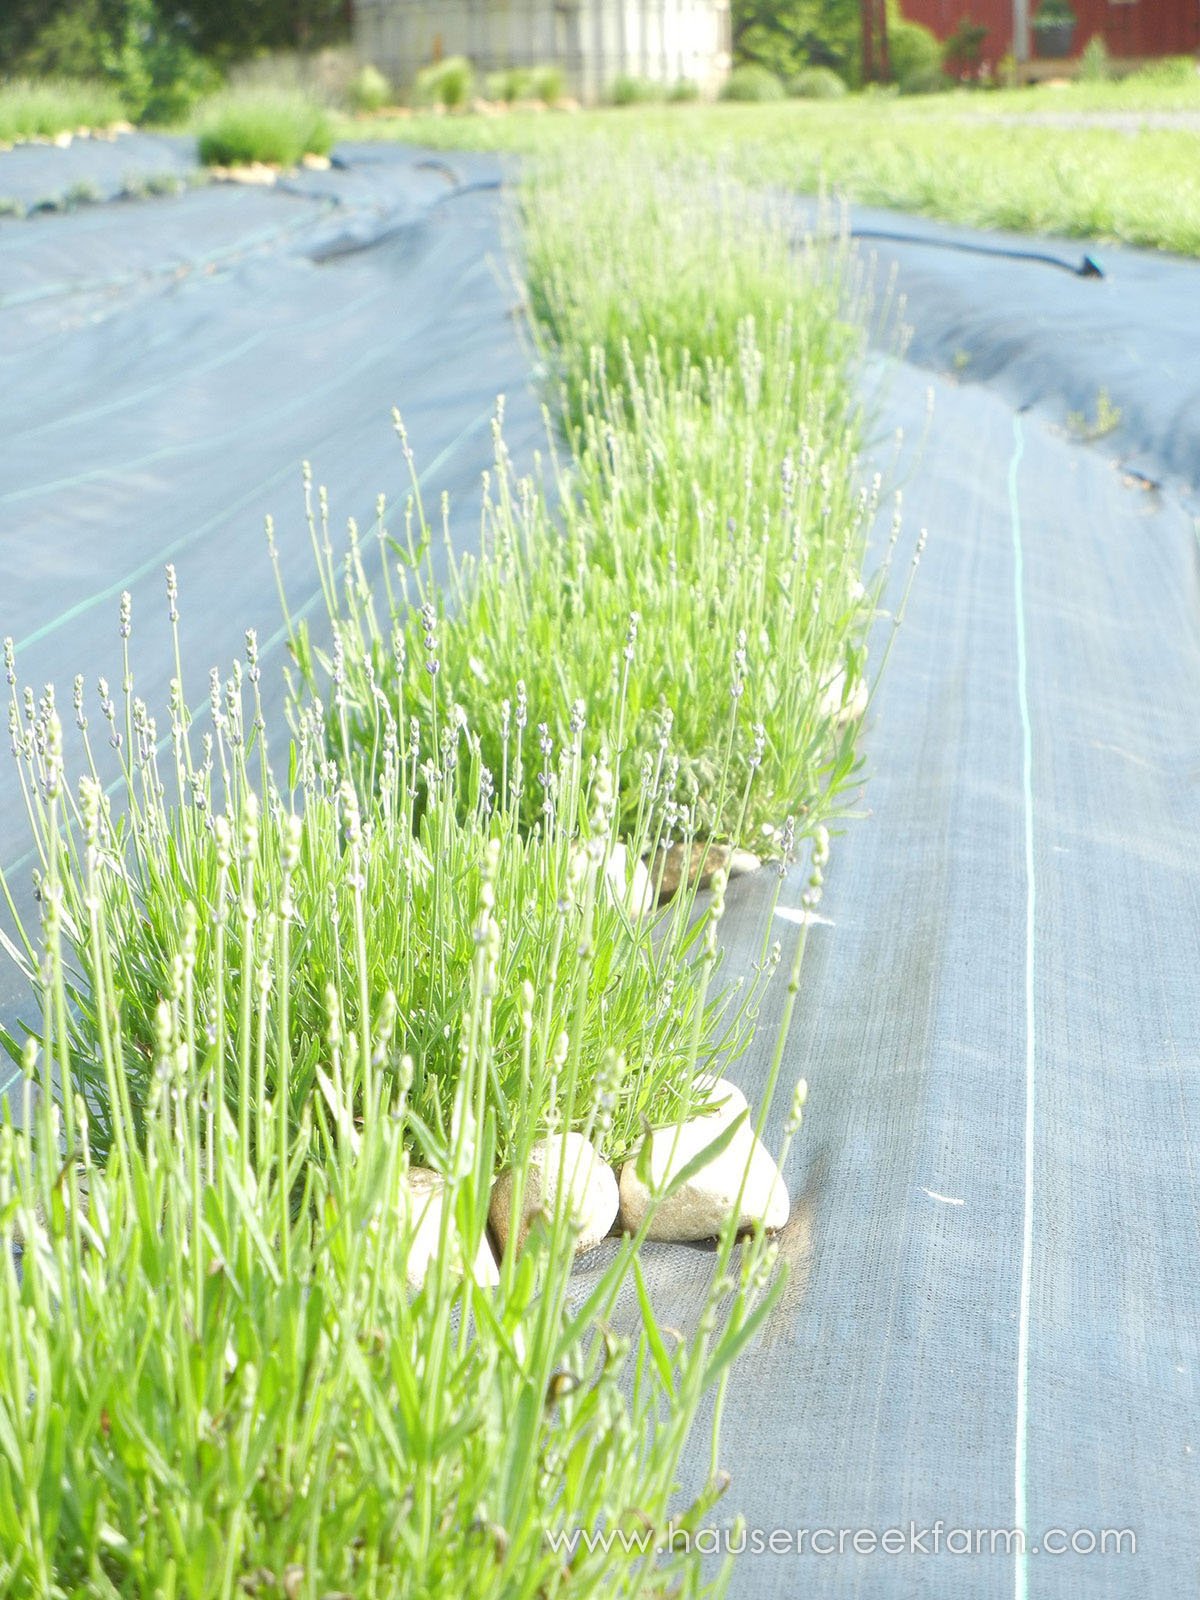 lush-green-rows-of-lavender-plants-growing-on-farm-HCF-Lavender10.jpg